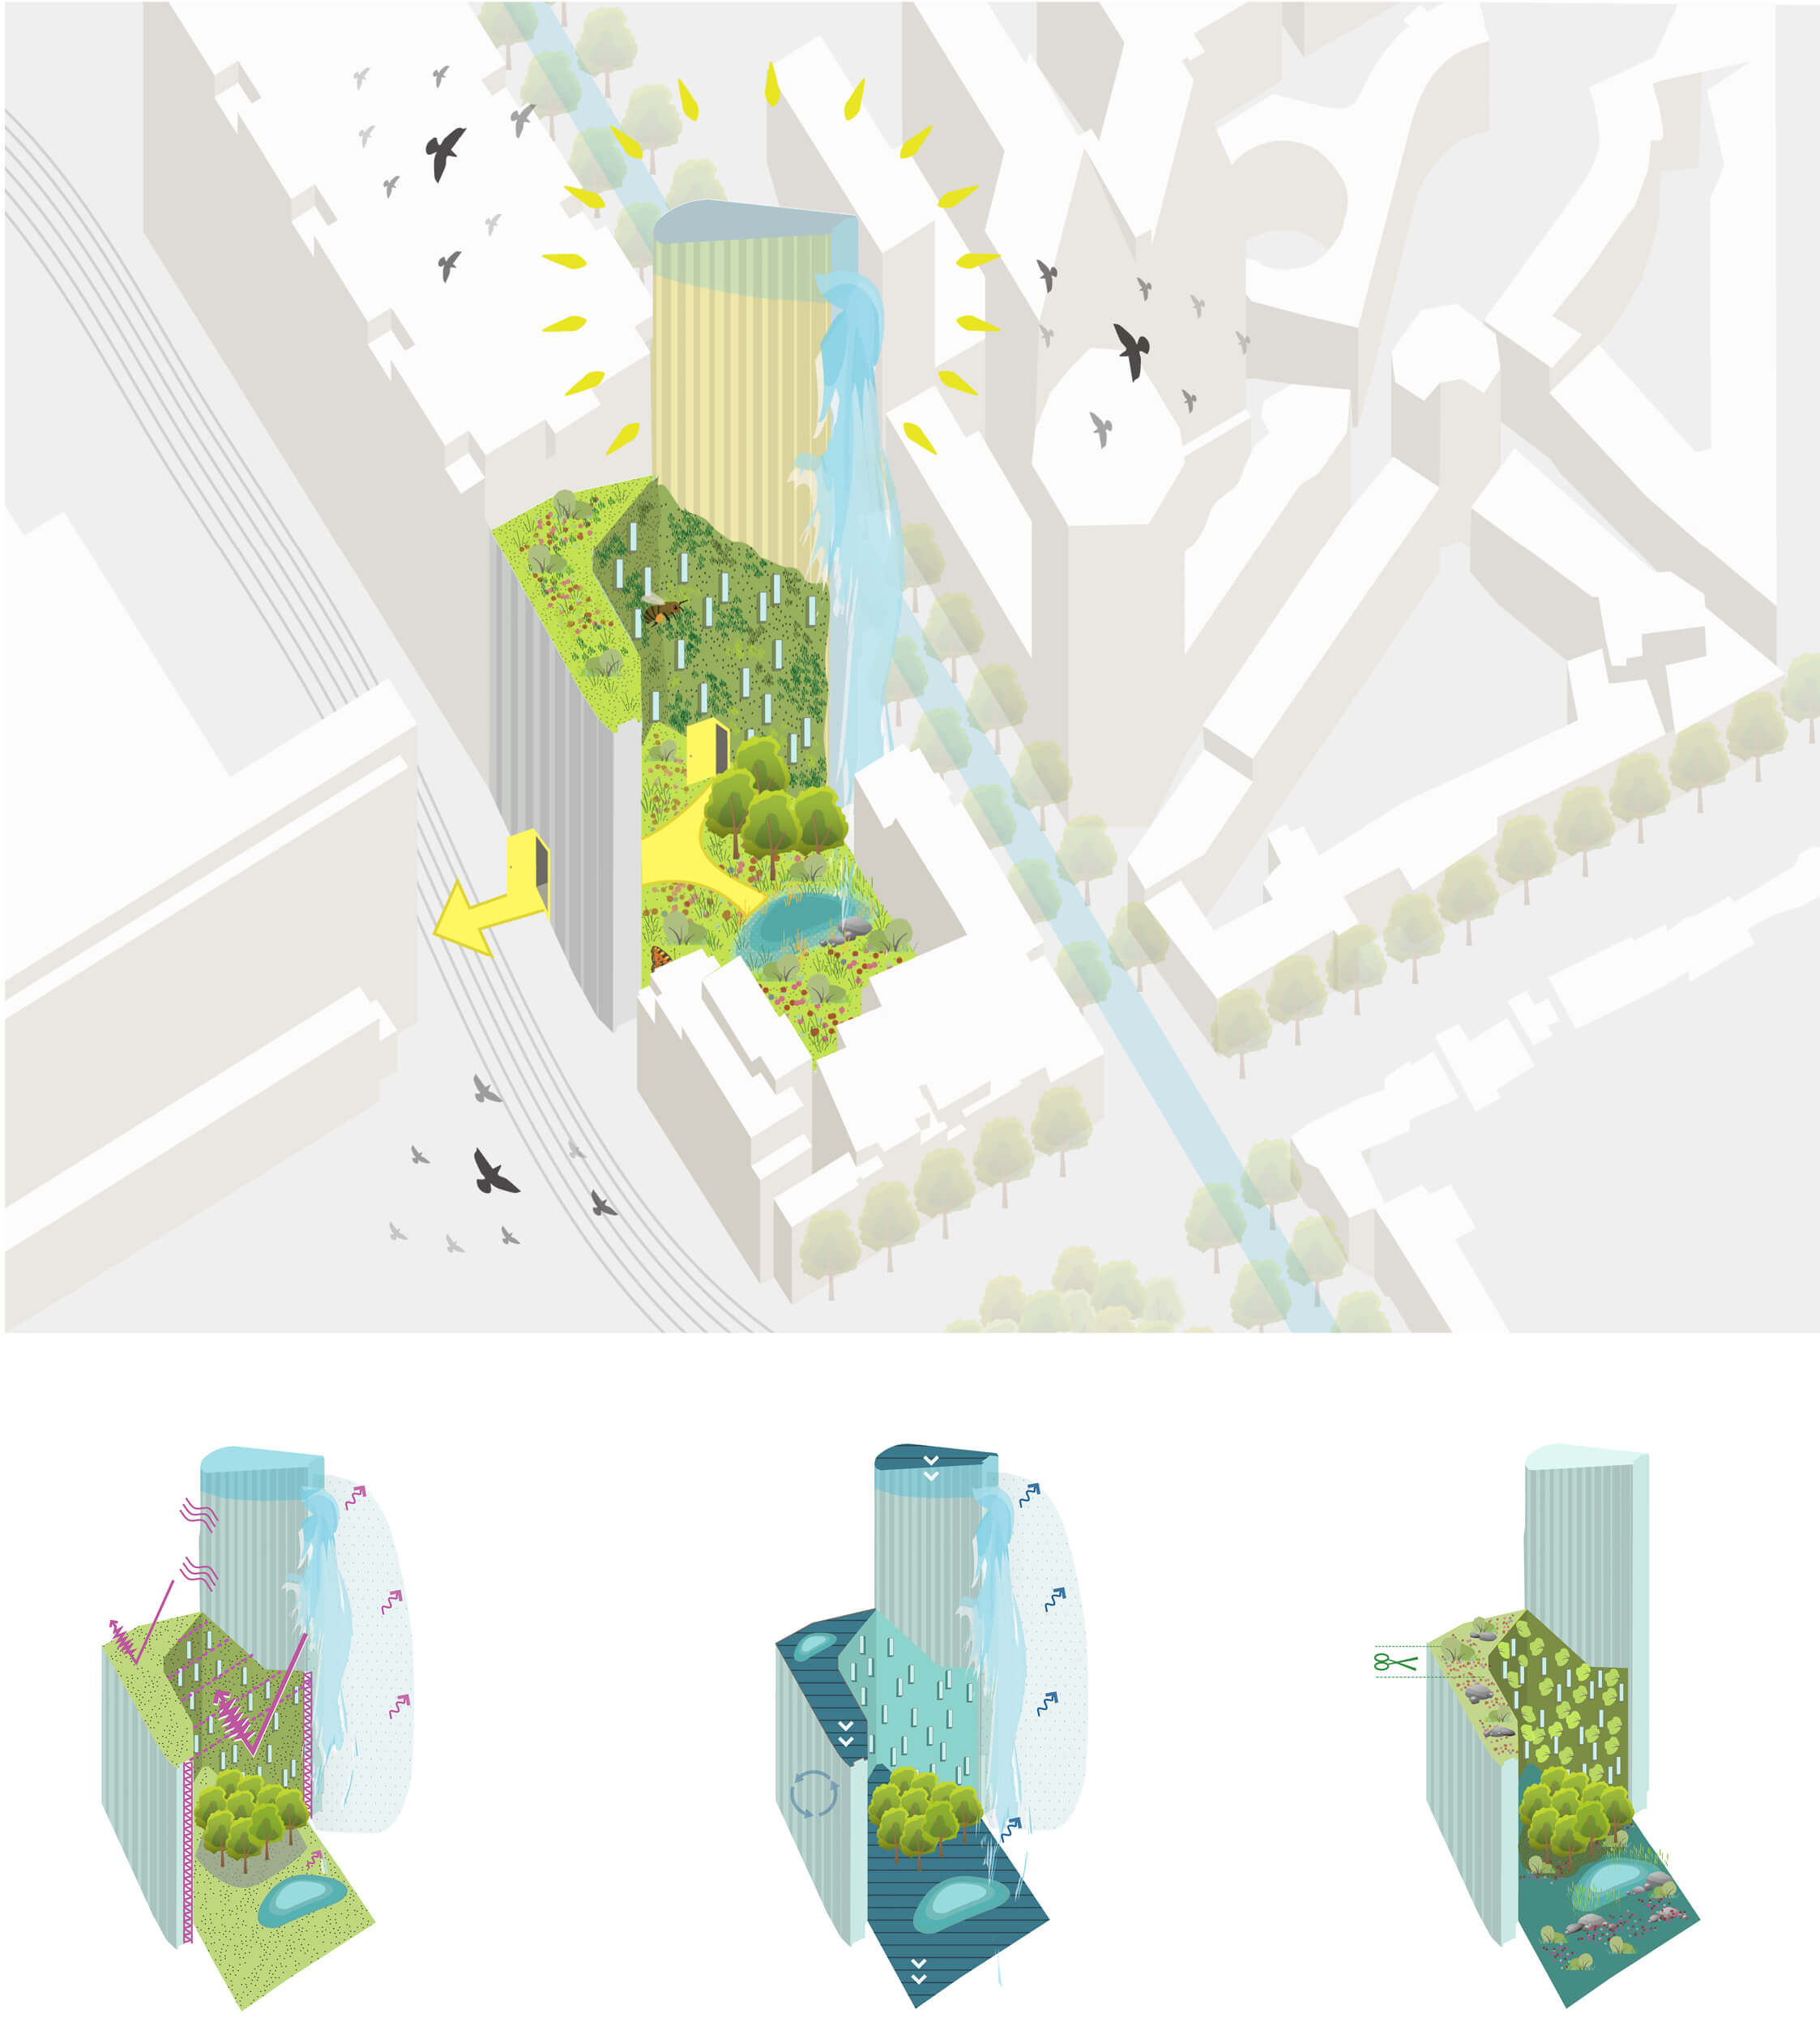 felixx-greenicons-concepthoftoren.jpg